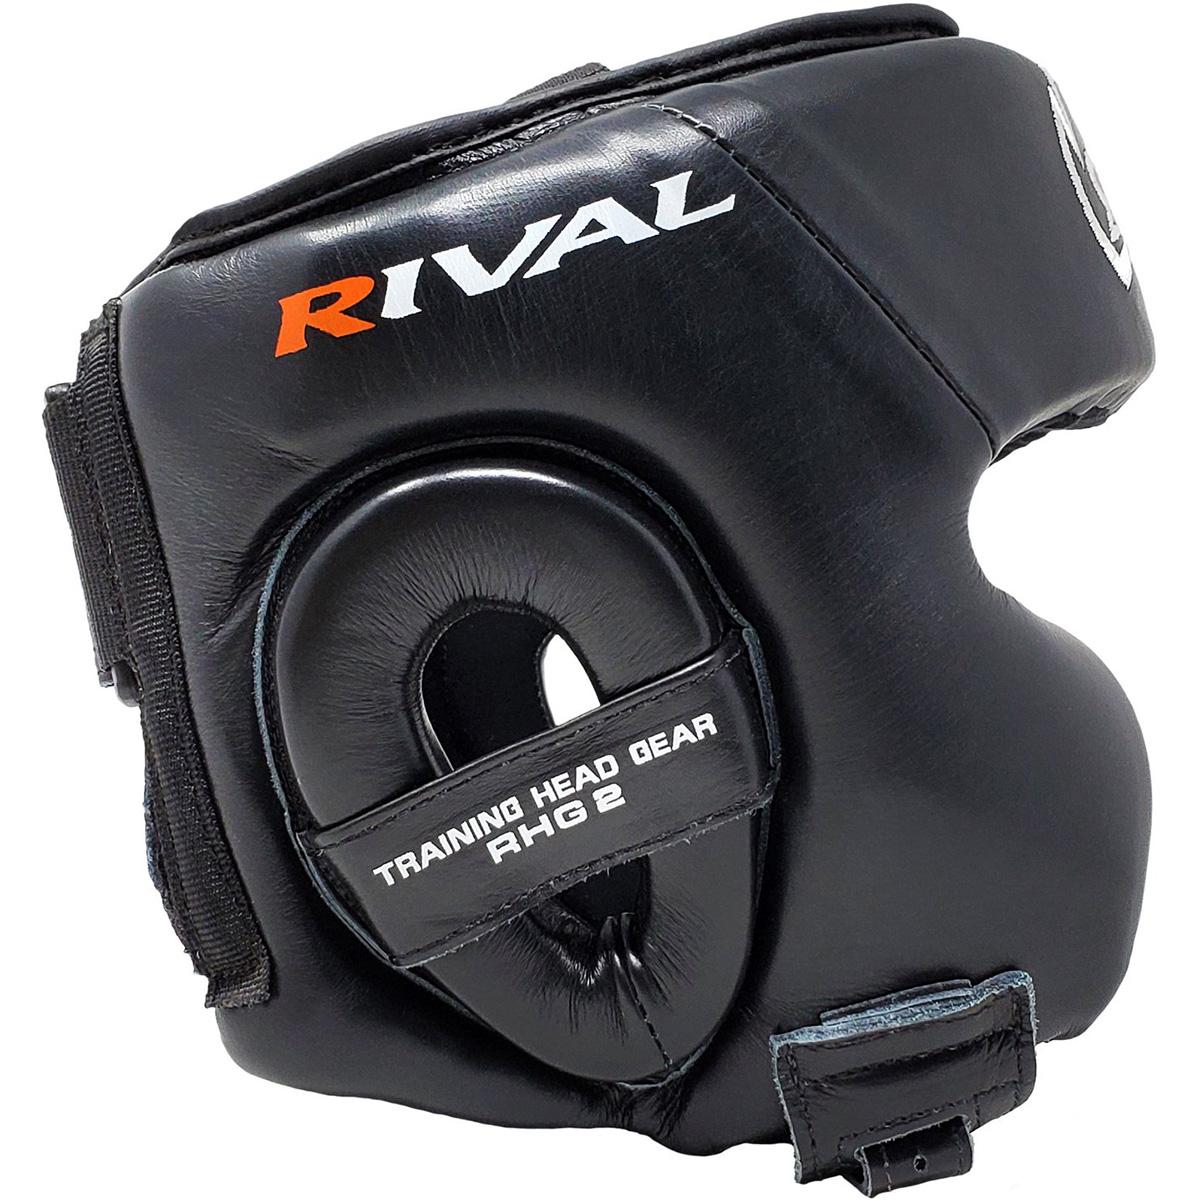 thumbnail 6 - RIVAL Boxing RHG2 Training Headgear